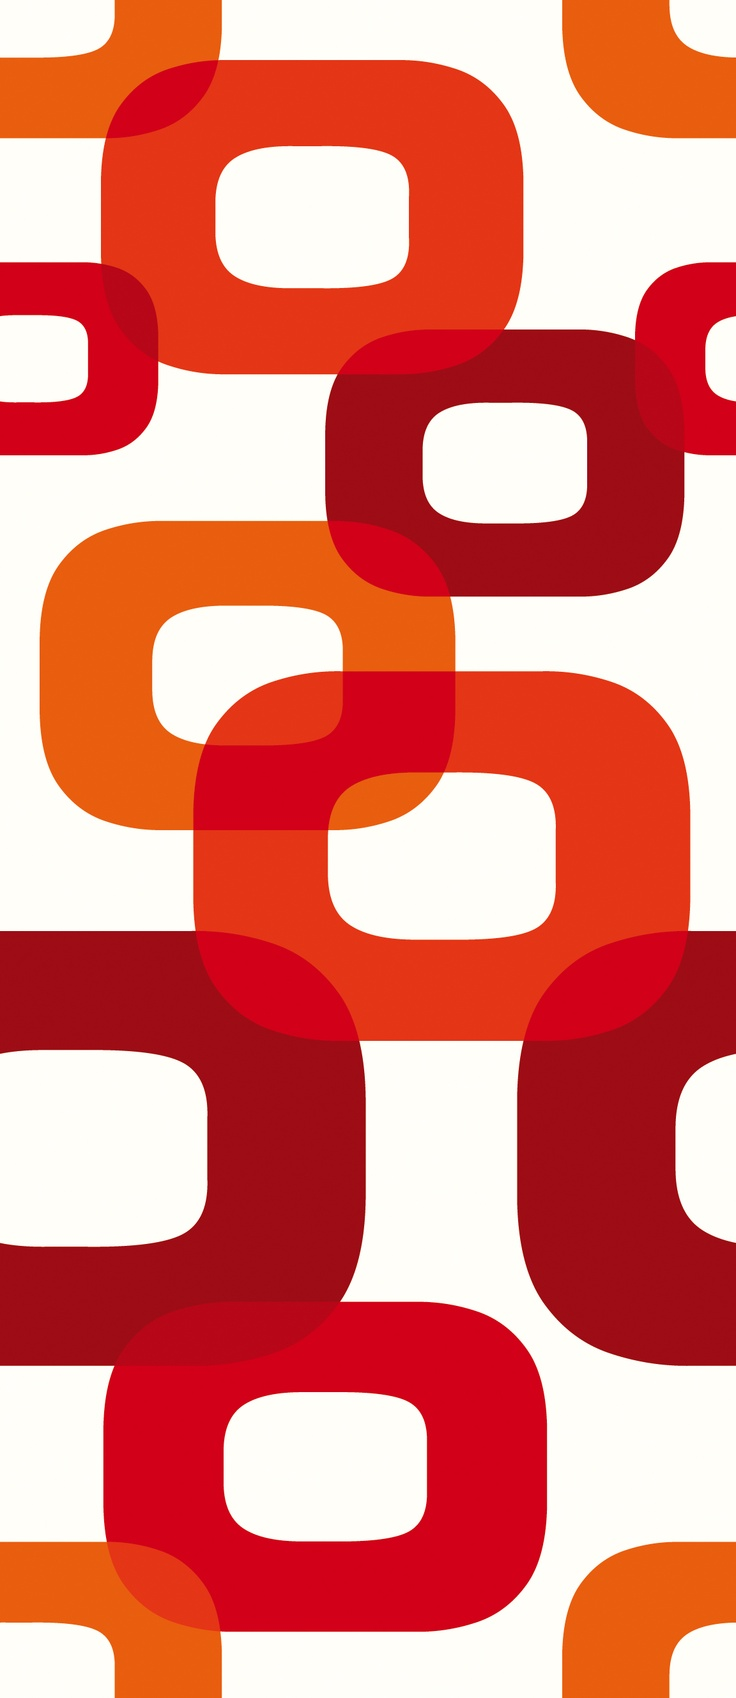 New Transparency - Cherry, wallpaper by Lars Contzen